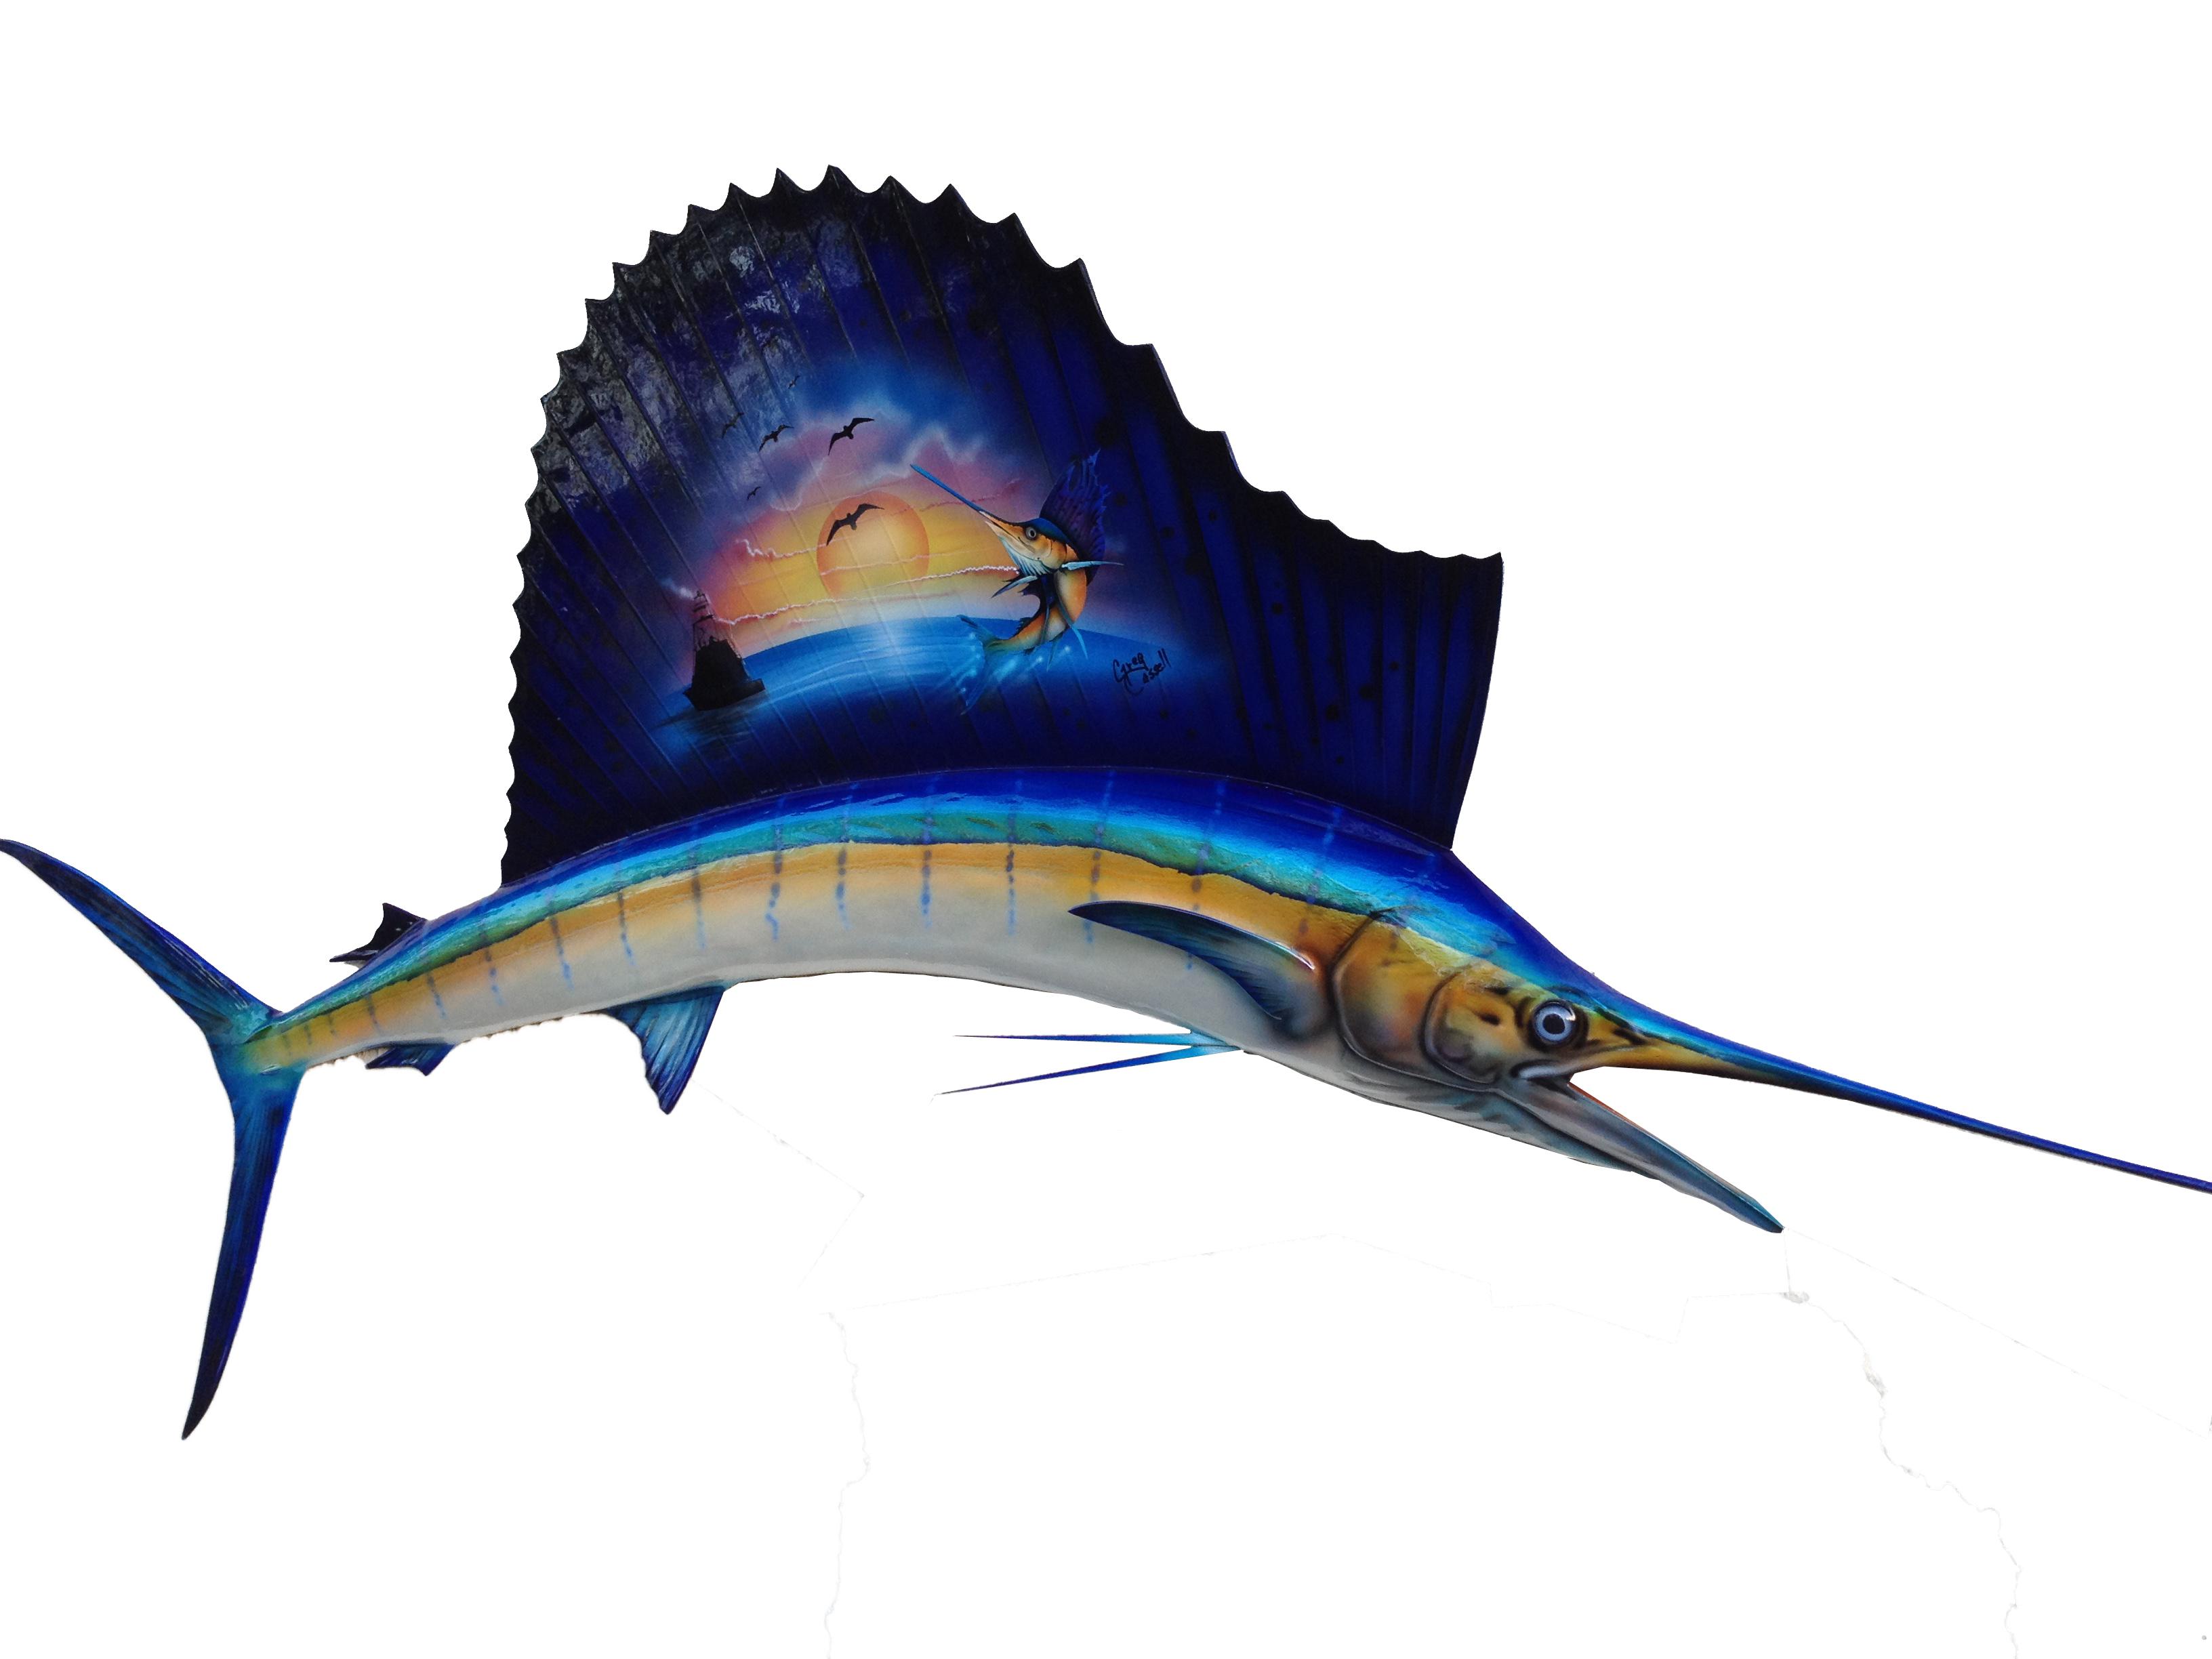 FISH-MOUNT-SAILFISH-MURAL-FIBERGLASS-TAXIDERMY-FISHMOUNT